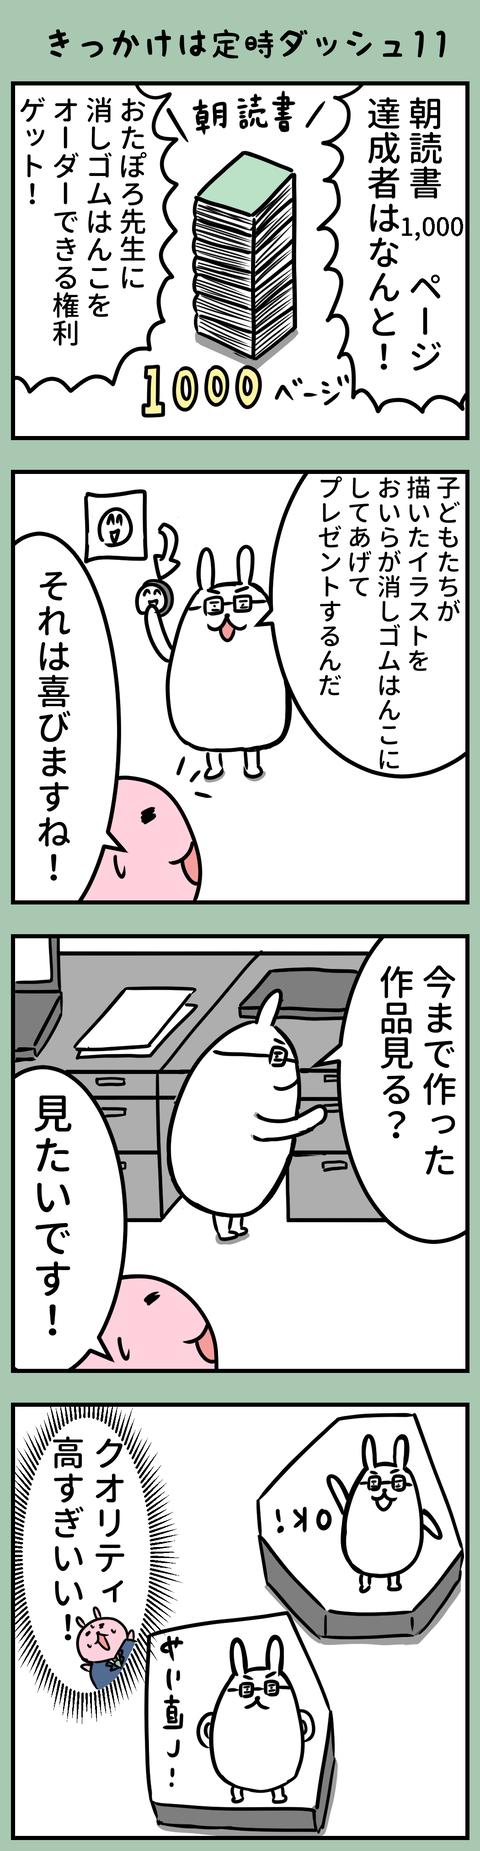 manga-yuzuporo60-1